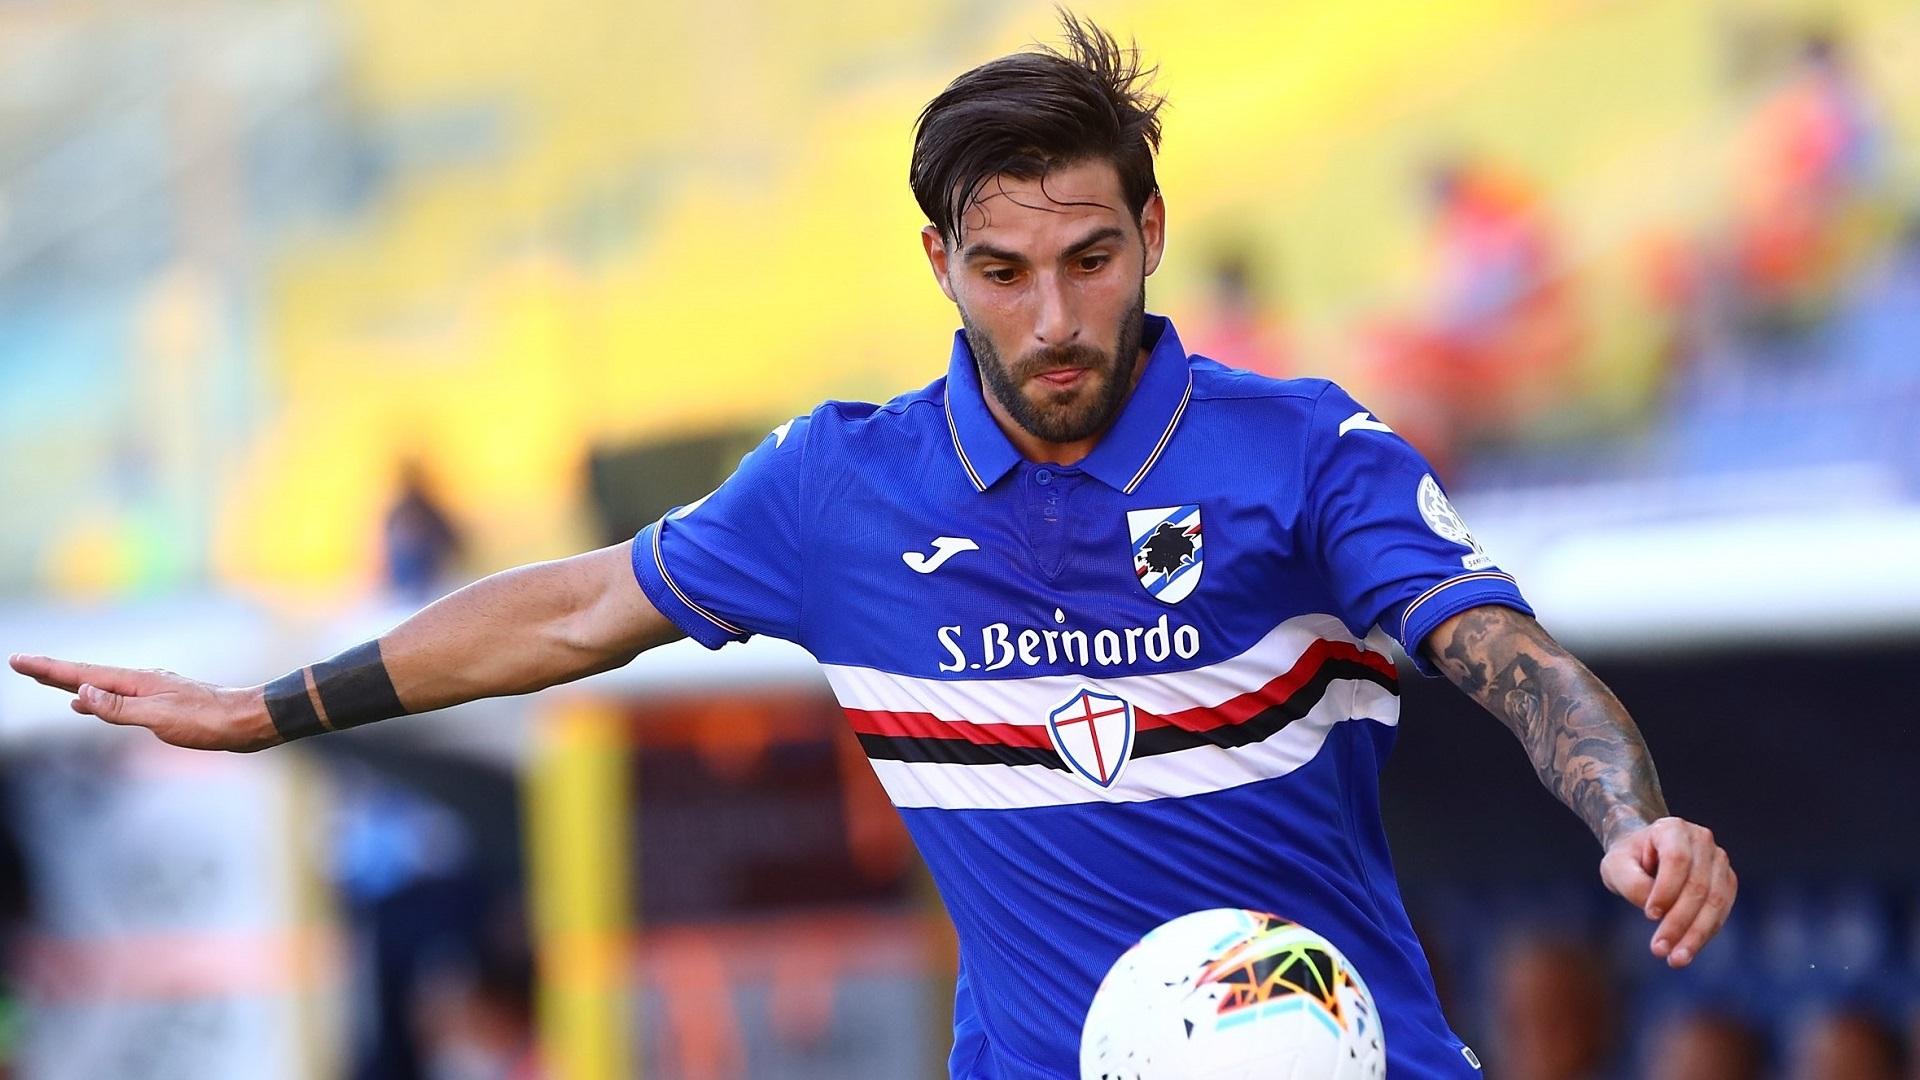 Murru fa ritorno a Cagliari: l'indiscrezione - Virgilio Sport